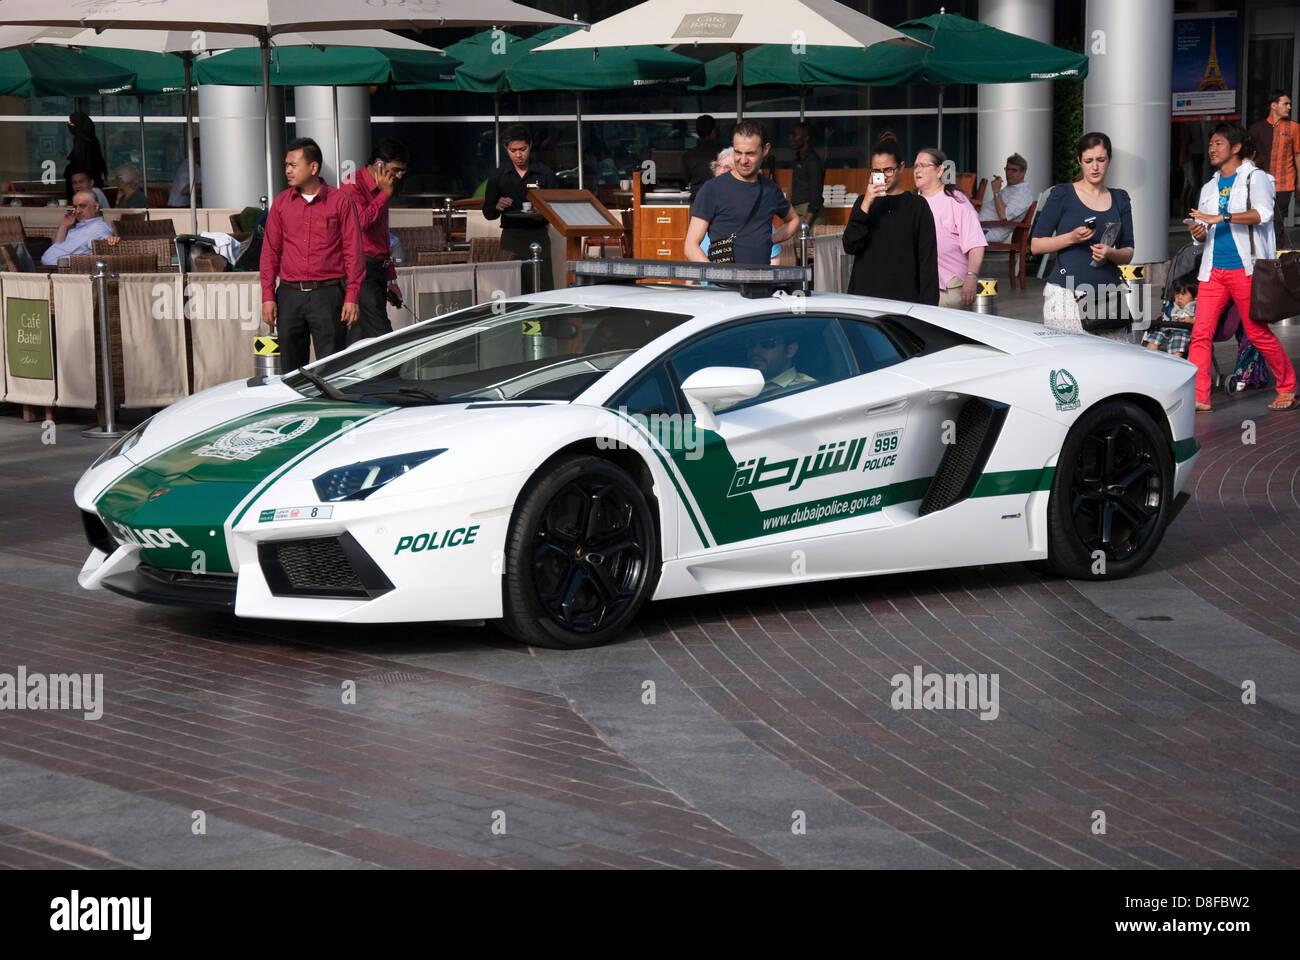 Dubai Police Lamborghini Aventador Lp700 4 Coupe Patrol